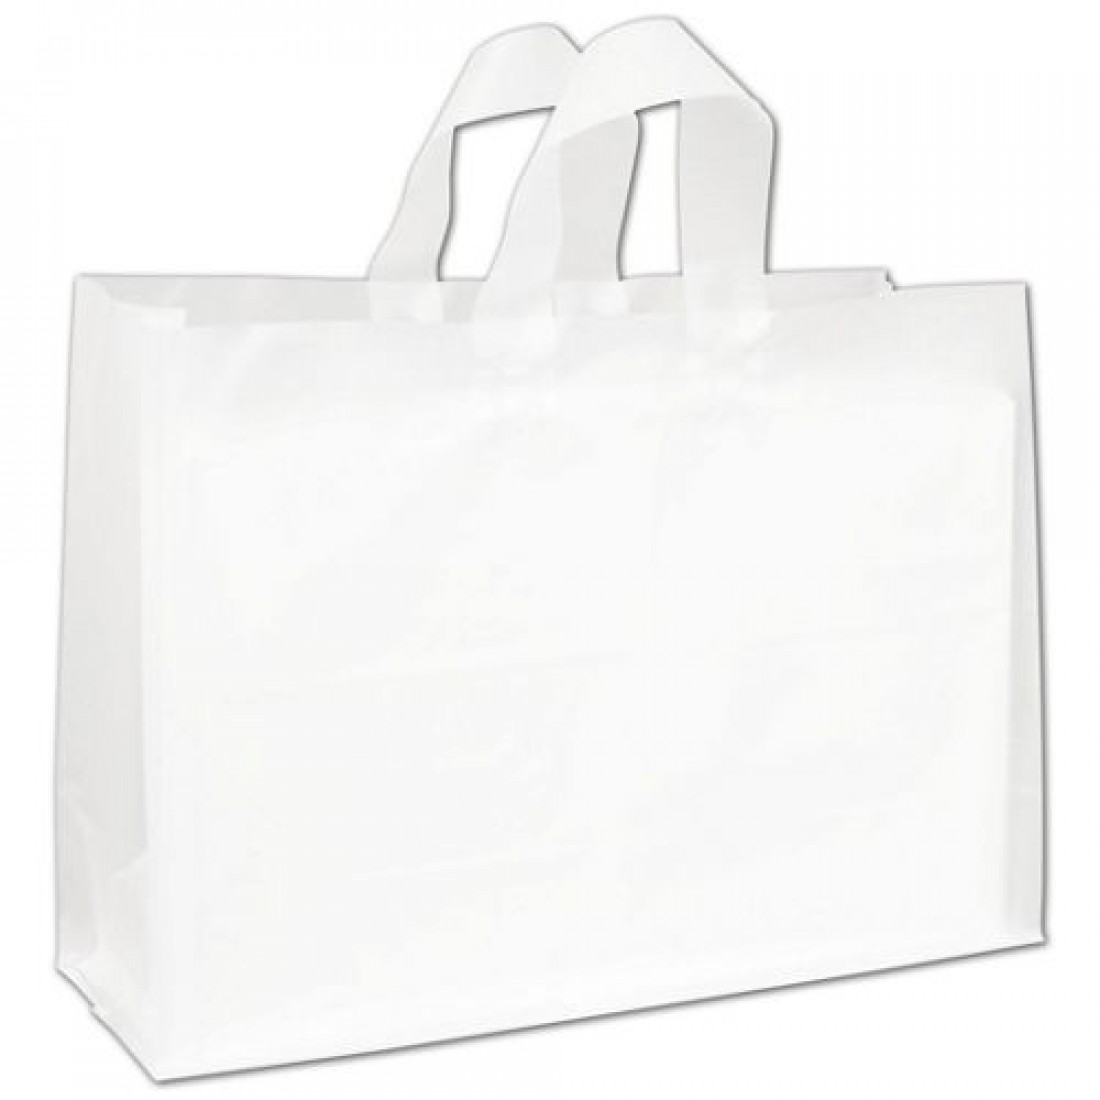 Clear Frst HiDen Bag 16x6x12